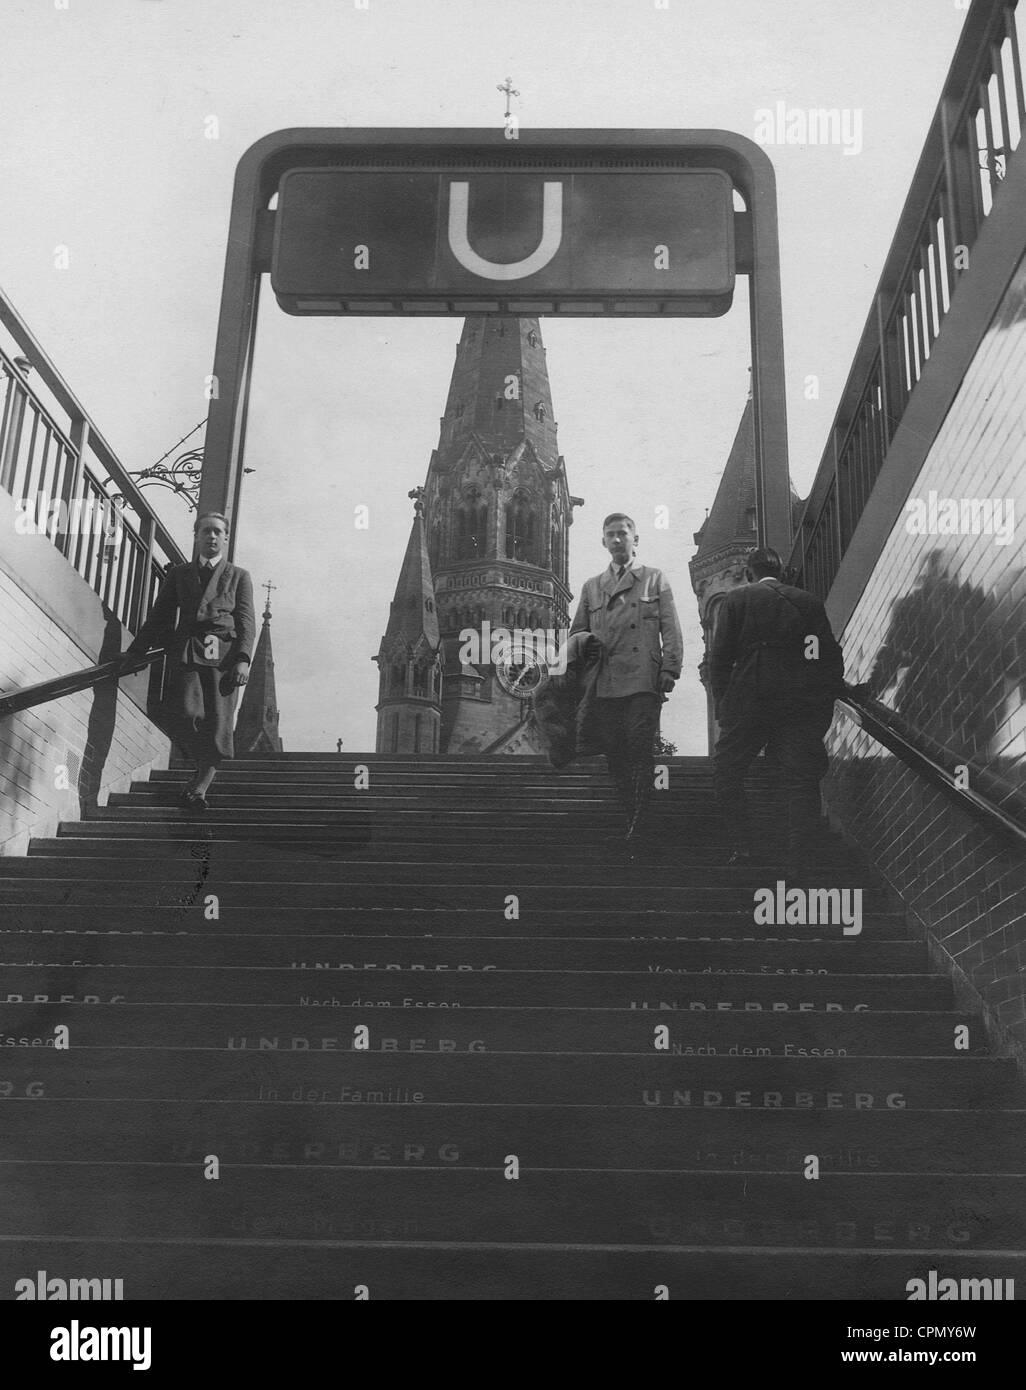 U Bahn U Bahn Eintritt Zoo In Berlin 1931 Stockfoto Bild